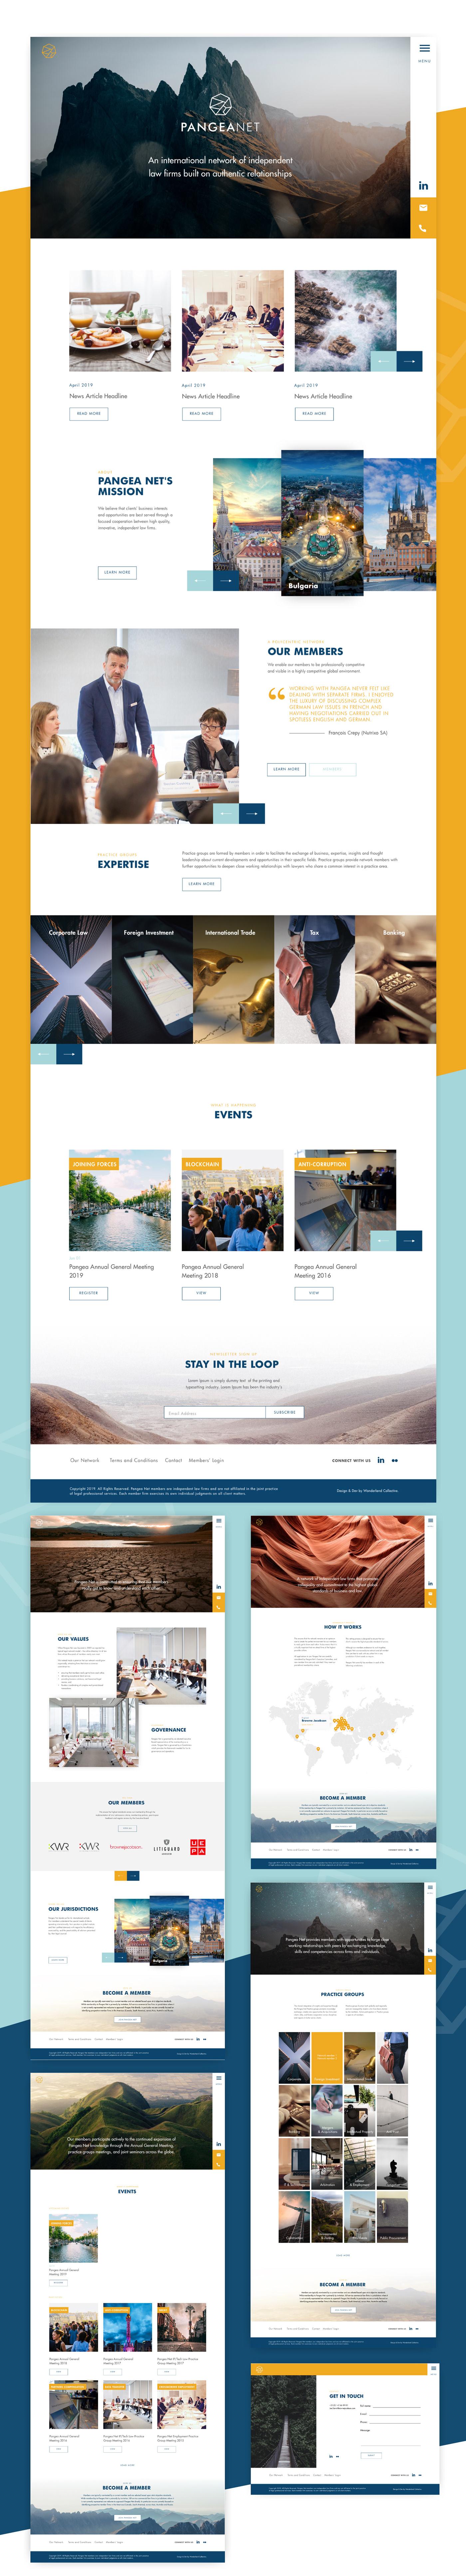 Web Design  law firm website pangea Network Website UI ux UI/UX Membership portal Website Design Global website